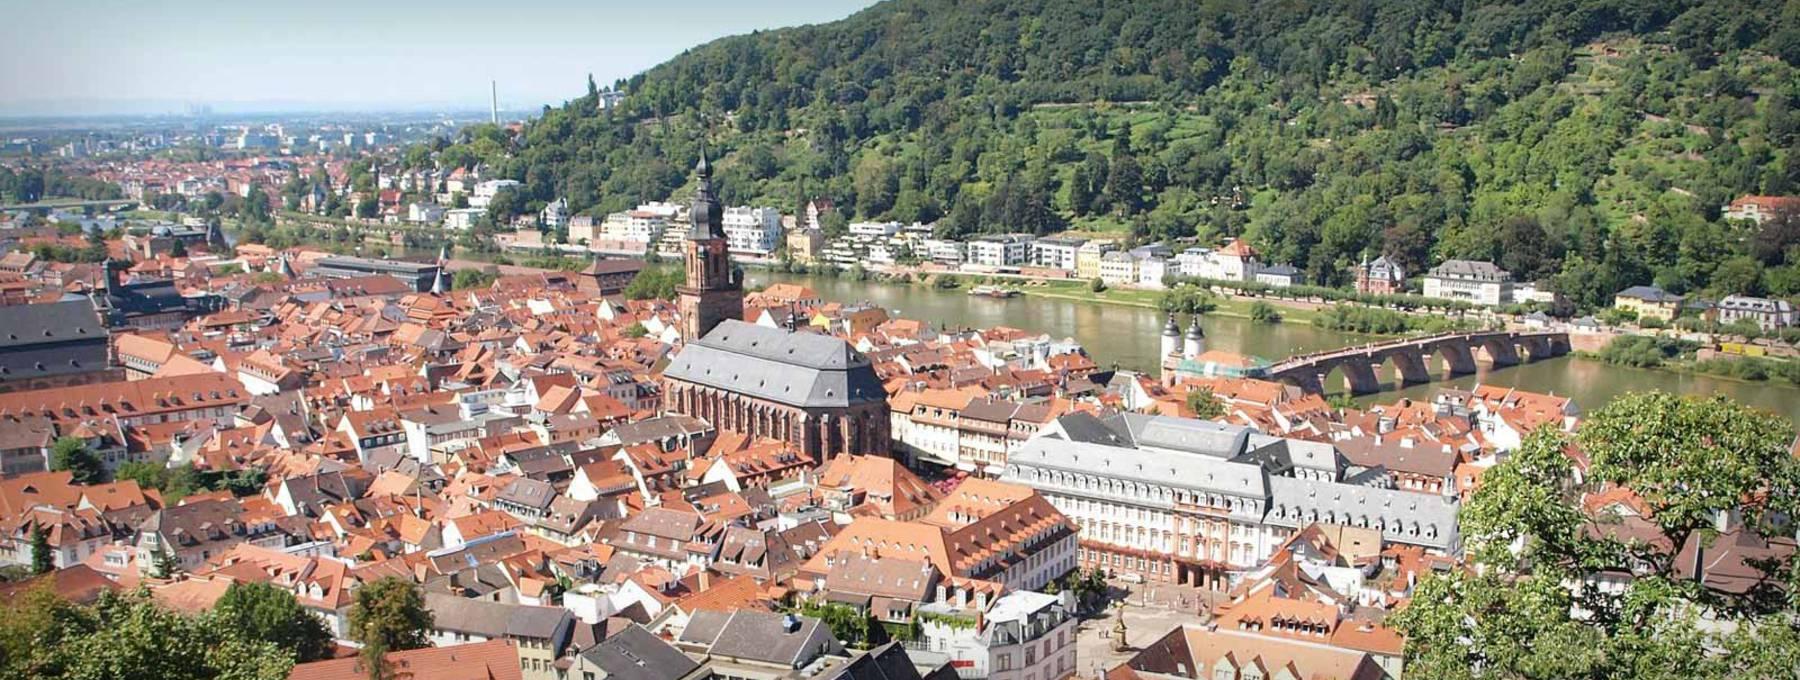 Beratung in Heidelberg